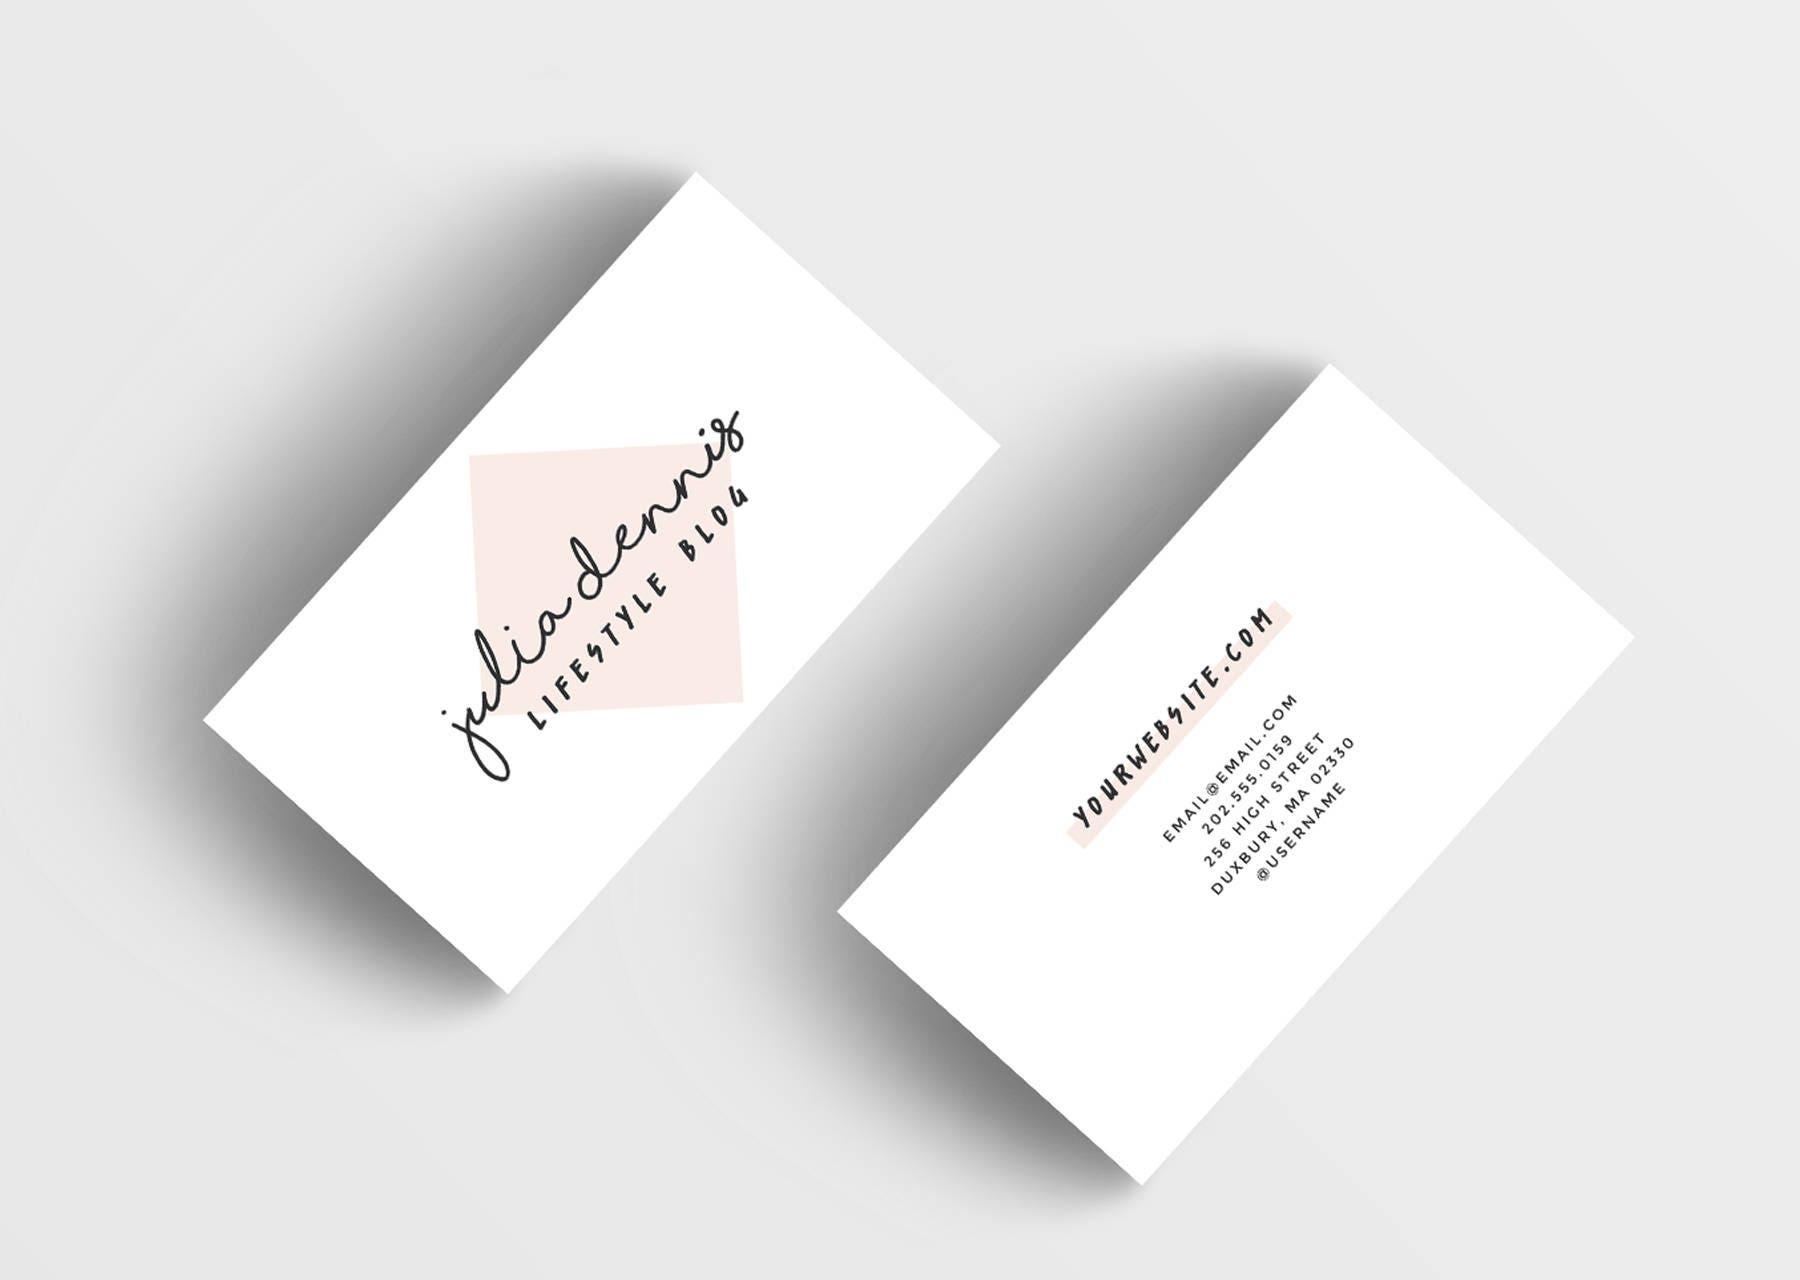 Rosa Visitenkarten-Design individuelle fertig zum Drucken